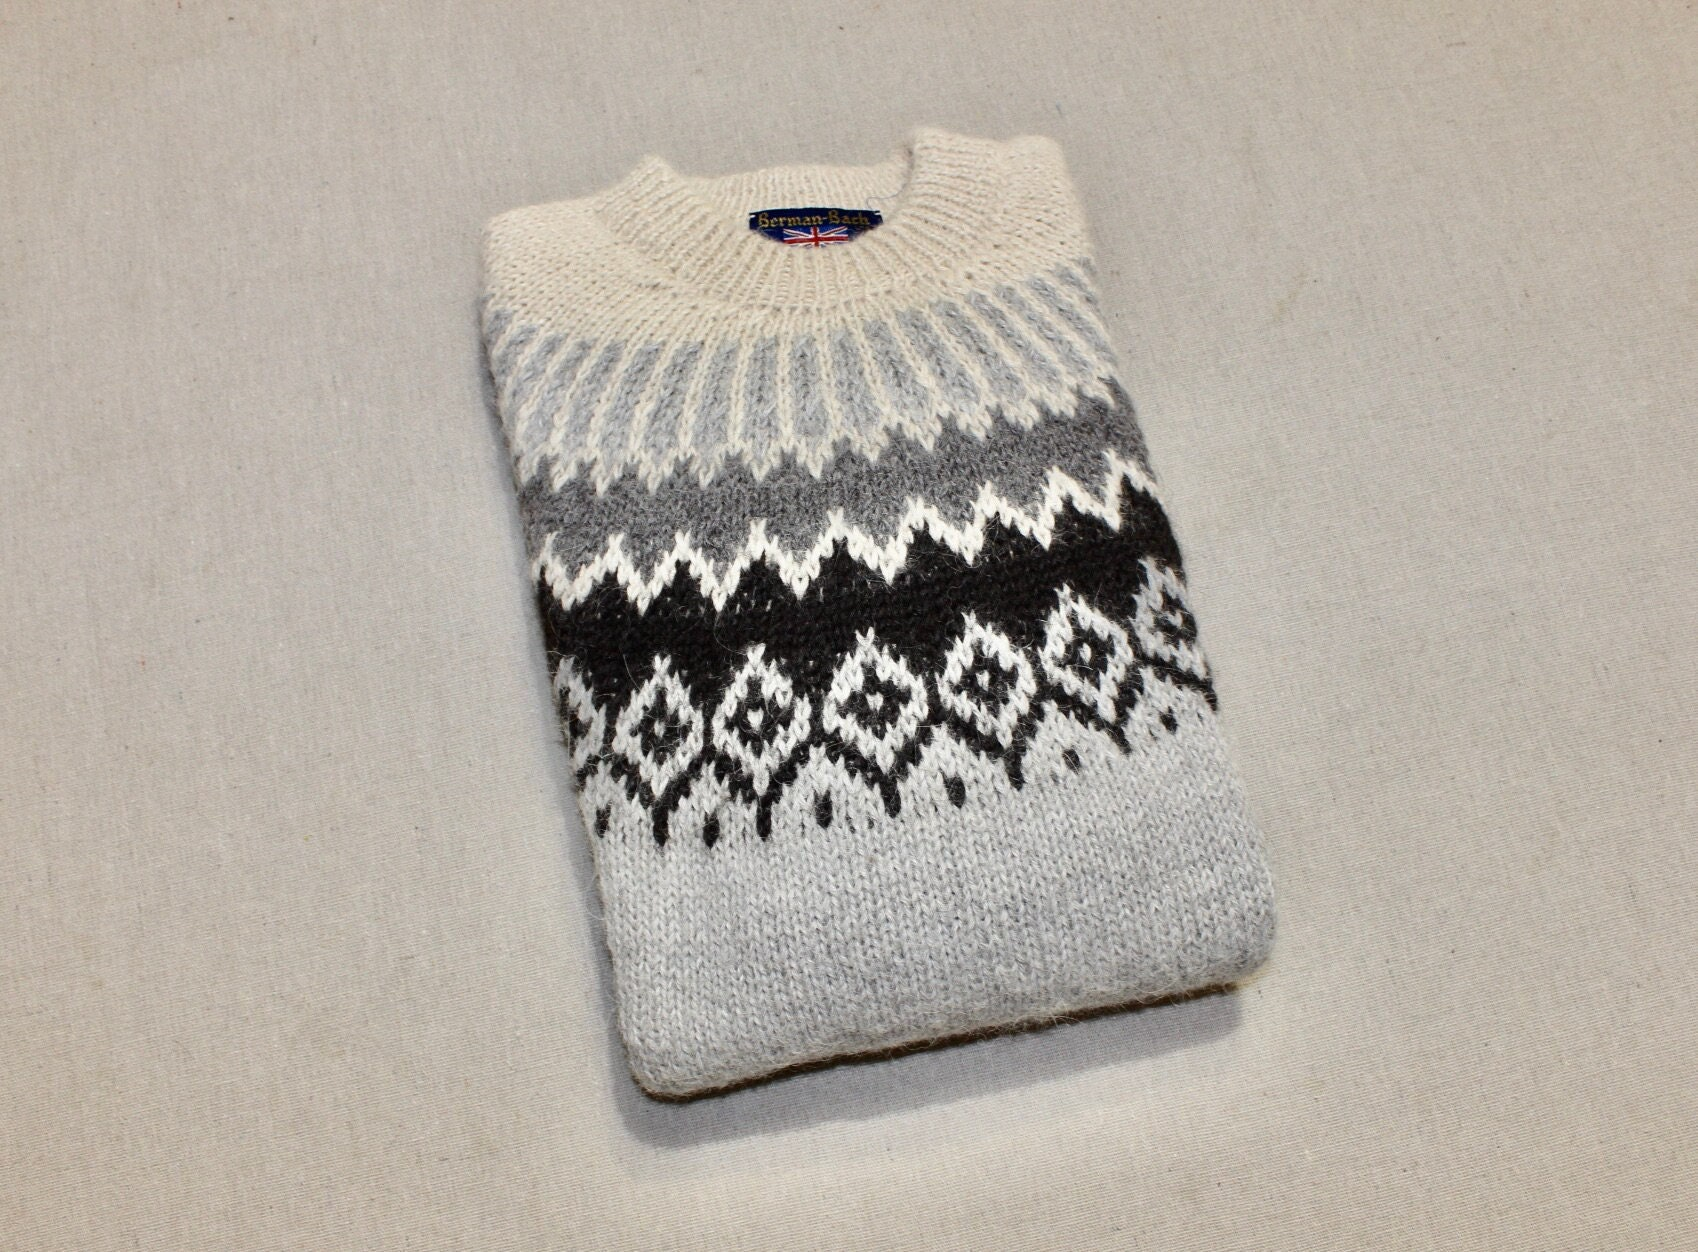 80s Sweatshirts, Sweaters, Vests | Women Vintage 1980s -Berman-BachMilwaukee- Type. Unisex Crew Neck Sweater. Icelandic Design - 100 Alpaca. Boys Large Or Womans Small $74.79 AT vintagedancer.com